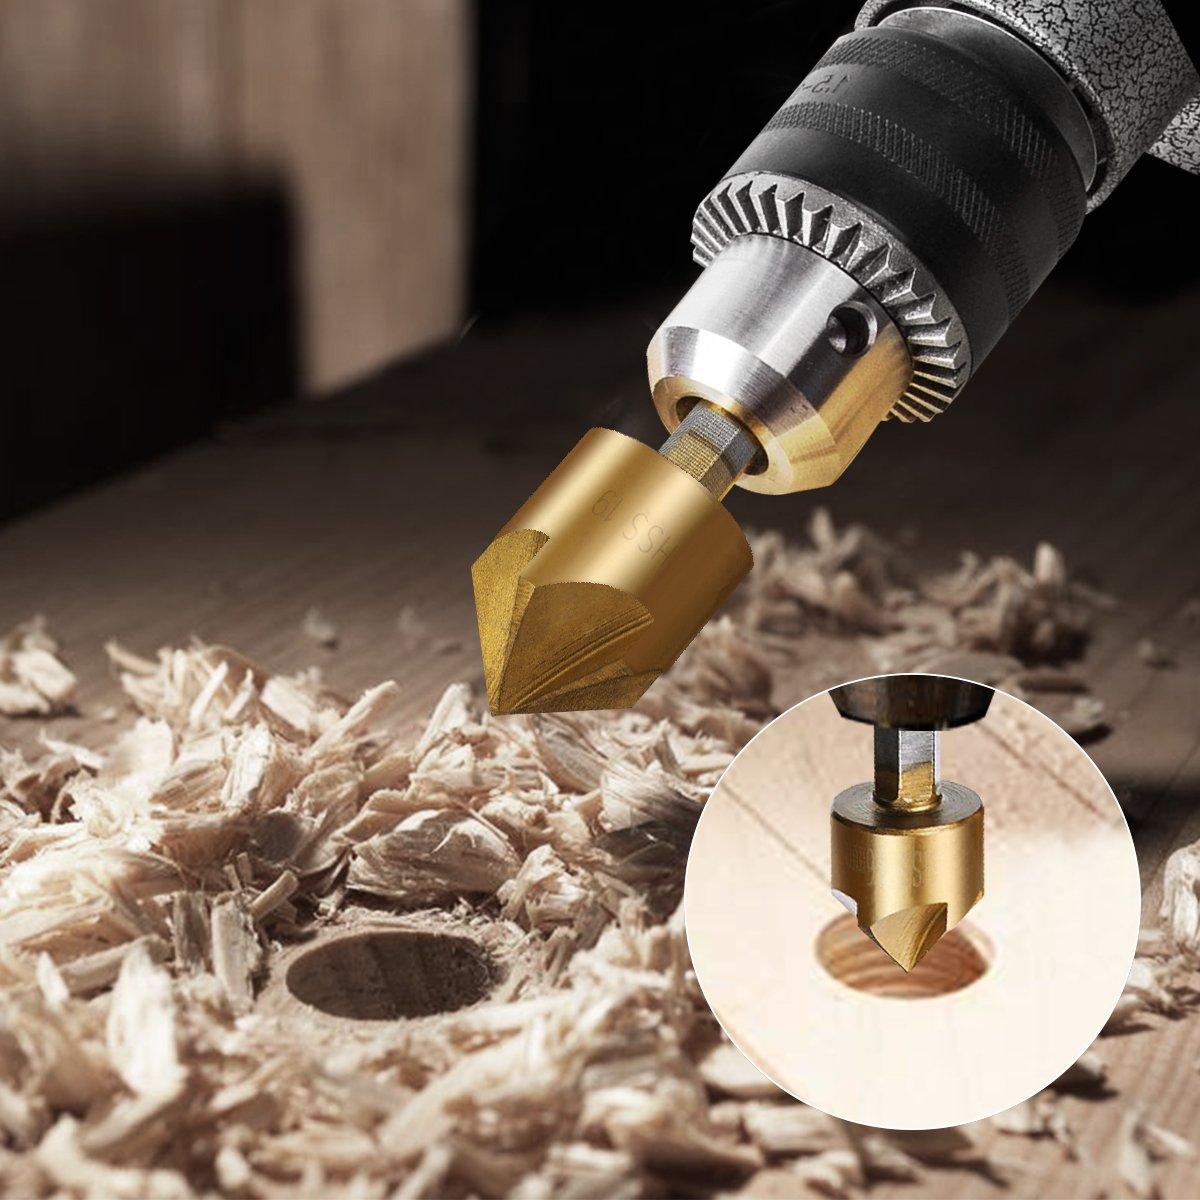 Countersink Drill Bit Baban Countersink Drill Bit Set 6 Pcs 1//4 Hex Shank HSS 5 Flute Countersink 90 Degree Center Punch Tool Sets For Wood Quick Change Bit 6mm-19mm with A Box